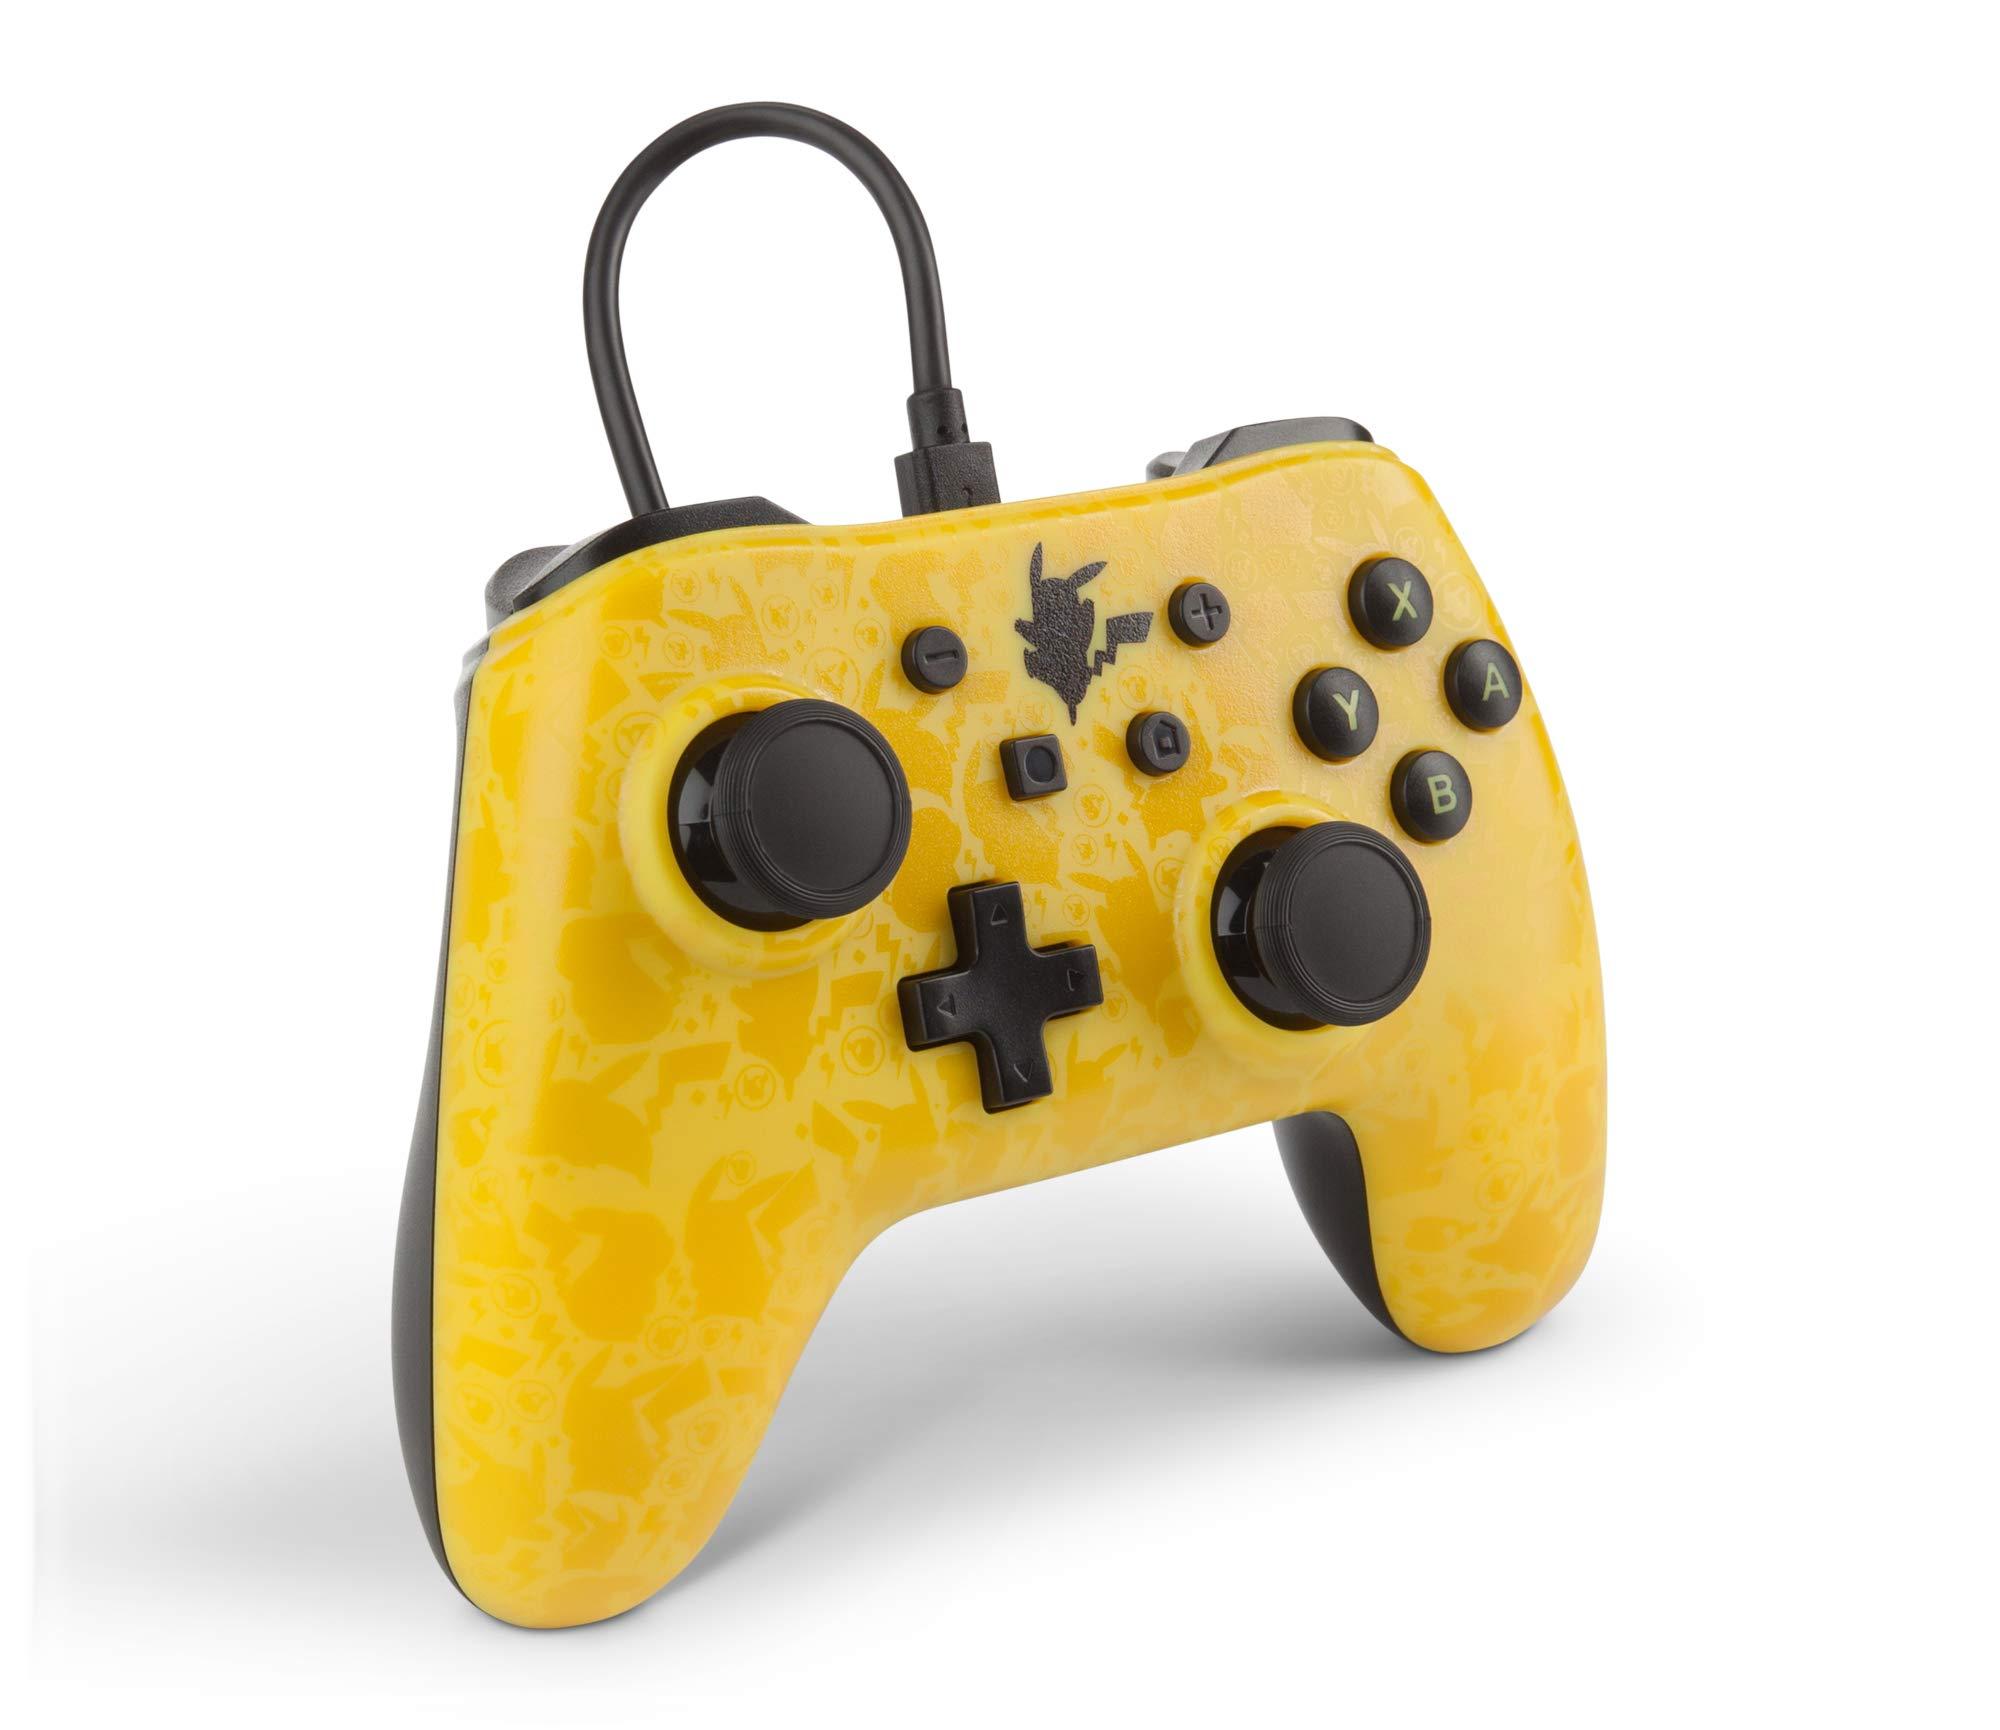 Mando con cable PowerA Pokémon para Nintendo Switch. Silueta de Pikachu: Amazon.es: Videojuegos